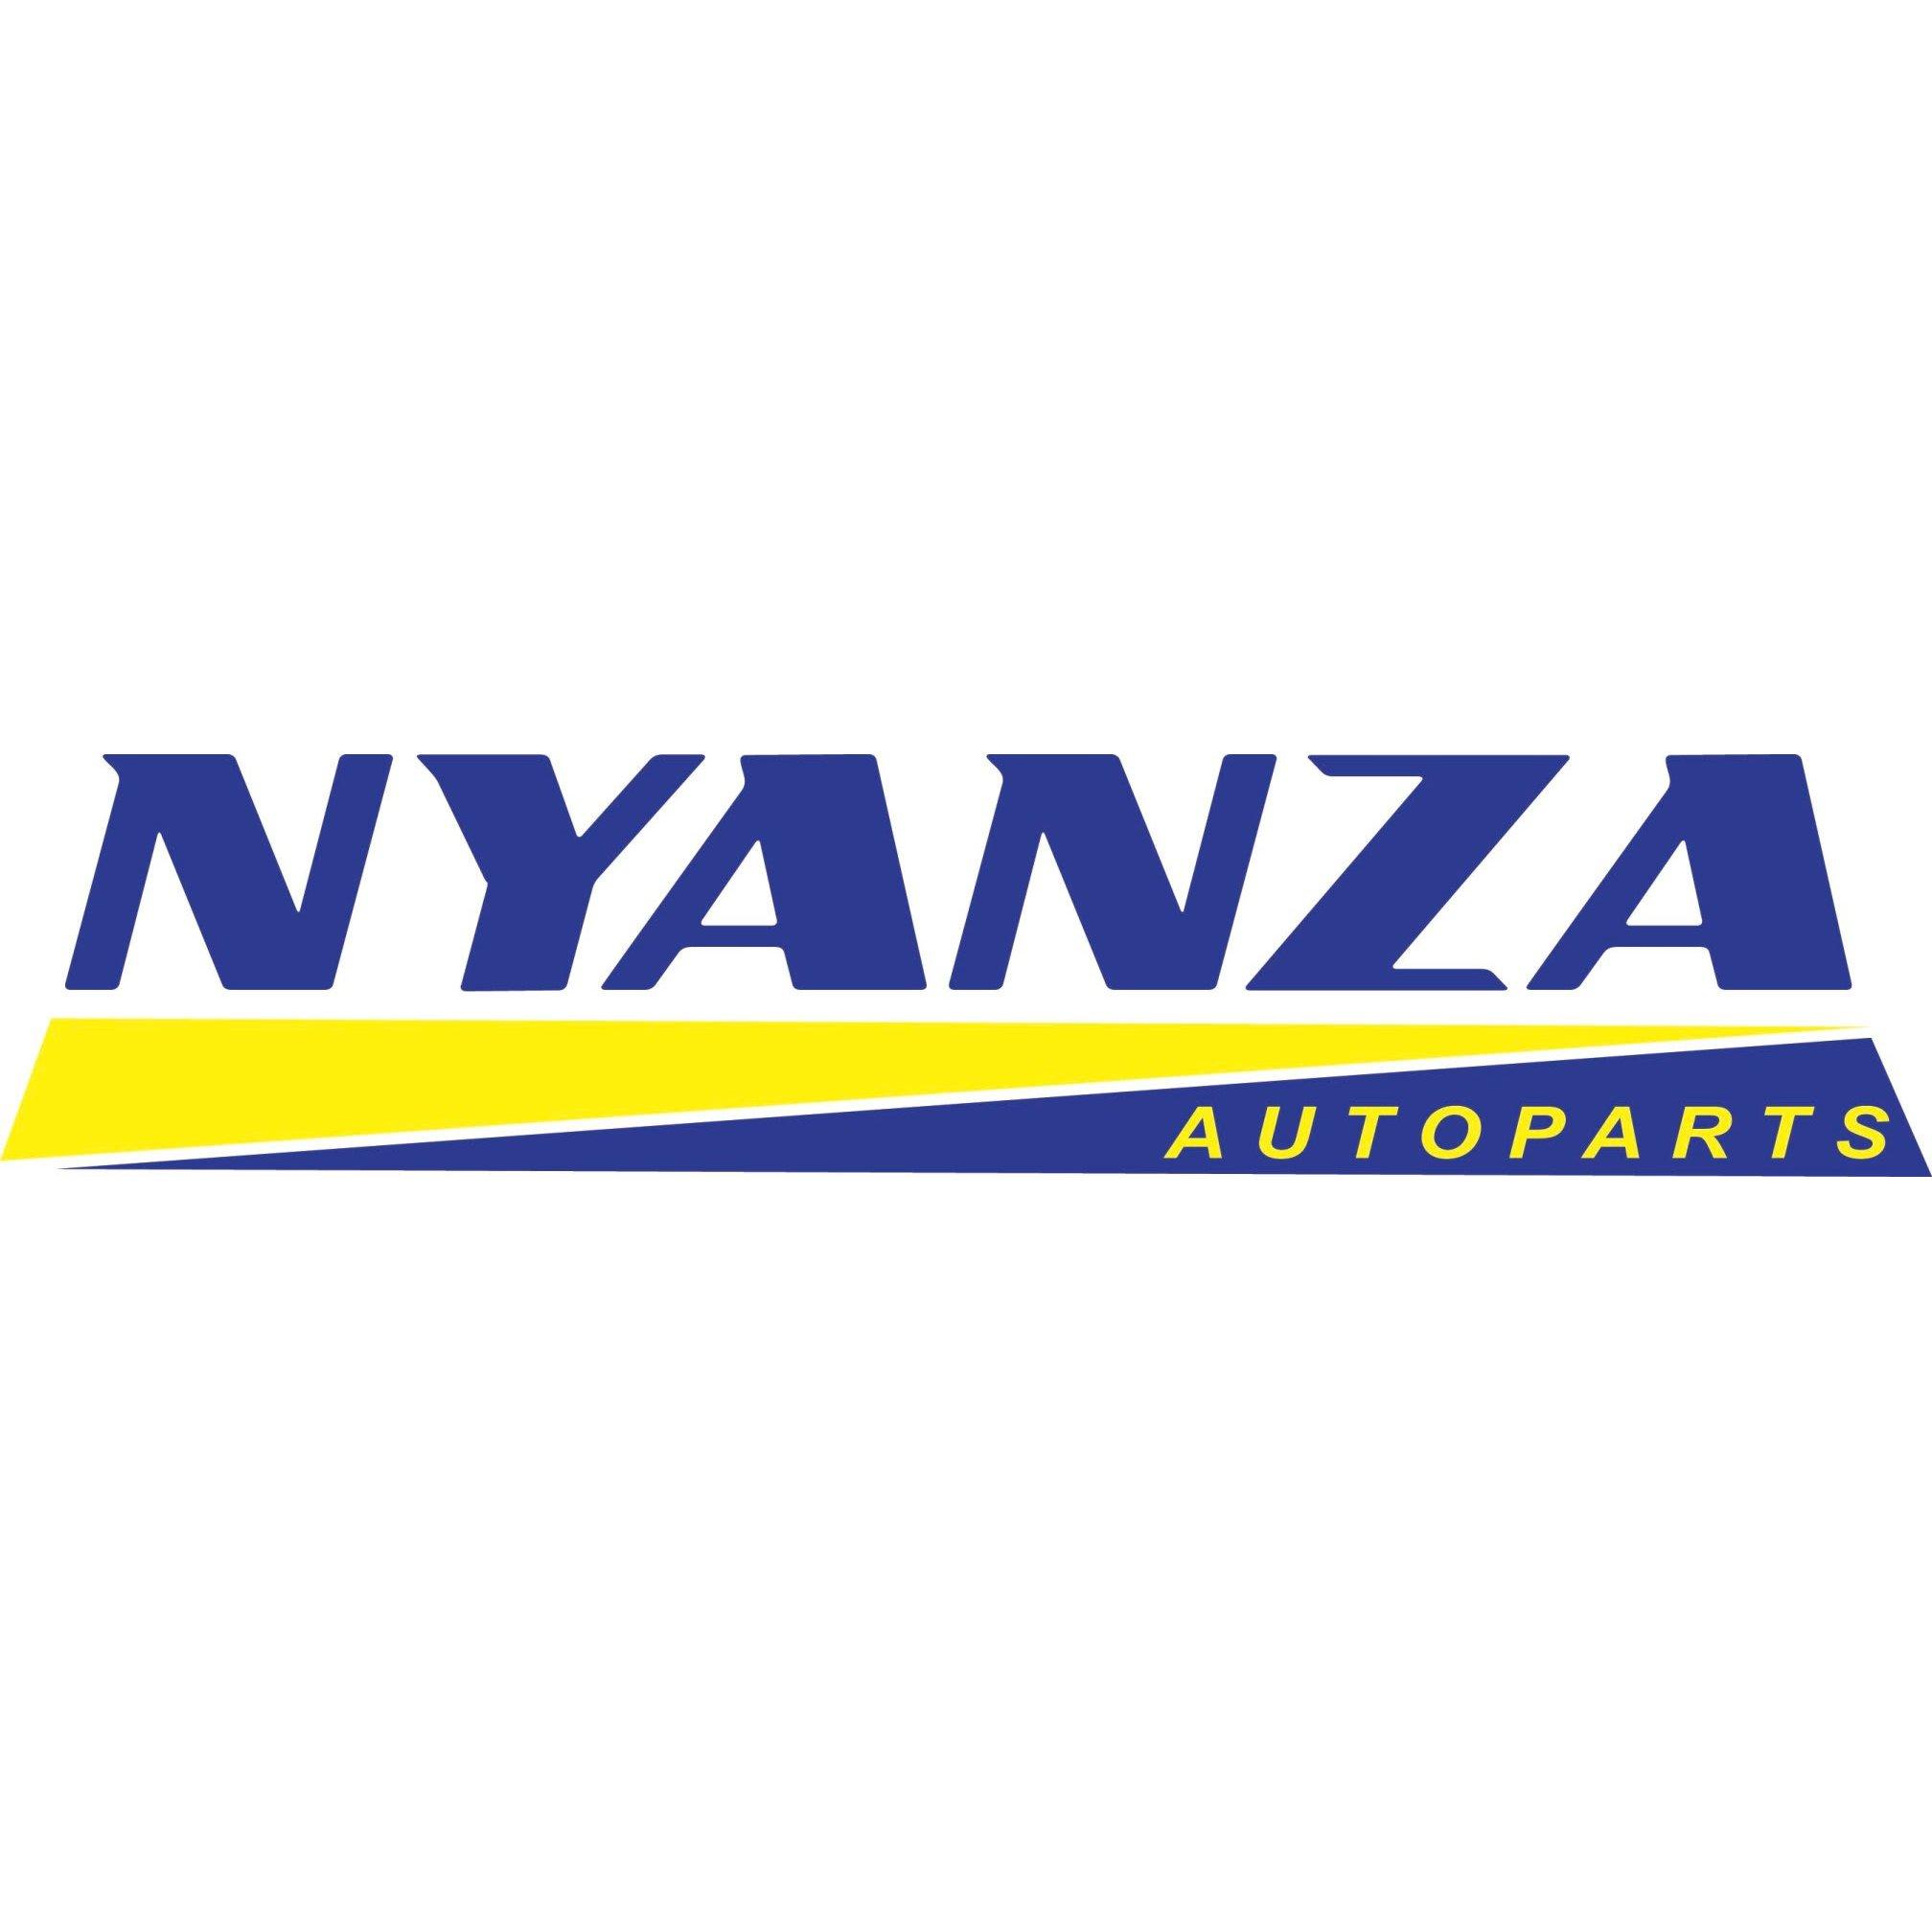 Nyanza Autoparts - Coventry, West Midlands CV6 4BH - 02476 663969 | ShowMeLocal.com